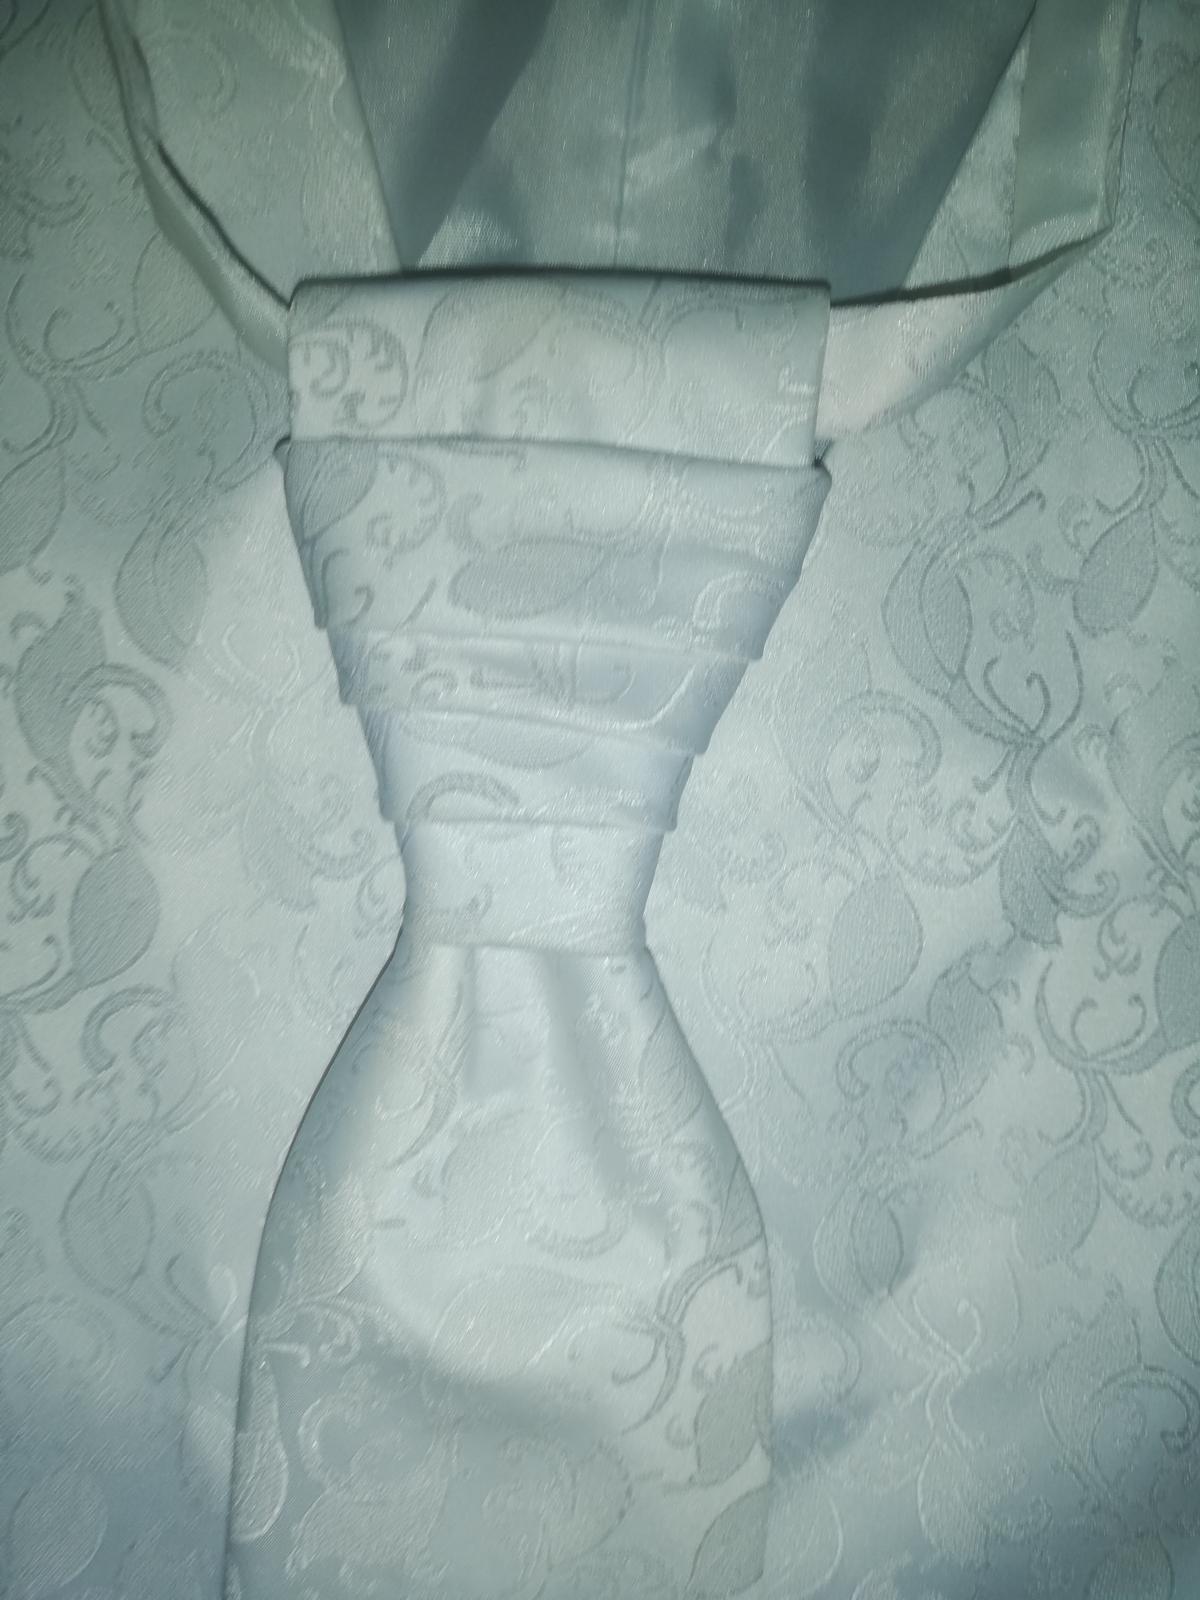 Svadobná vesta s kravatou pre ženícha - Obrázok č. 3